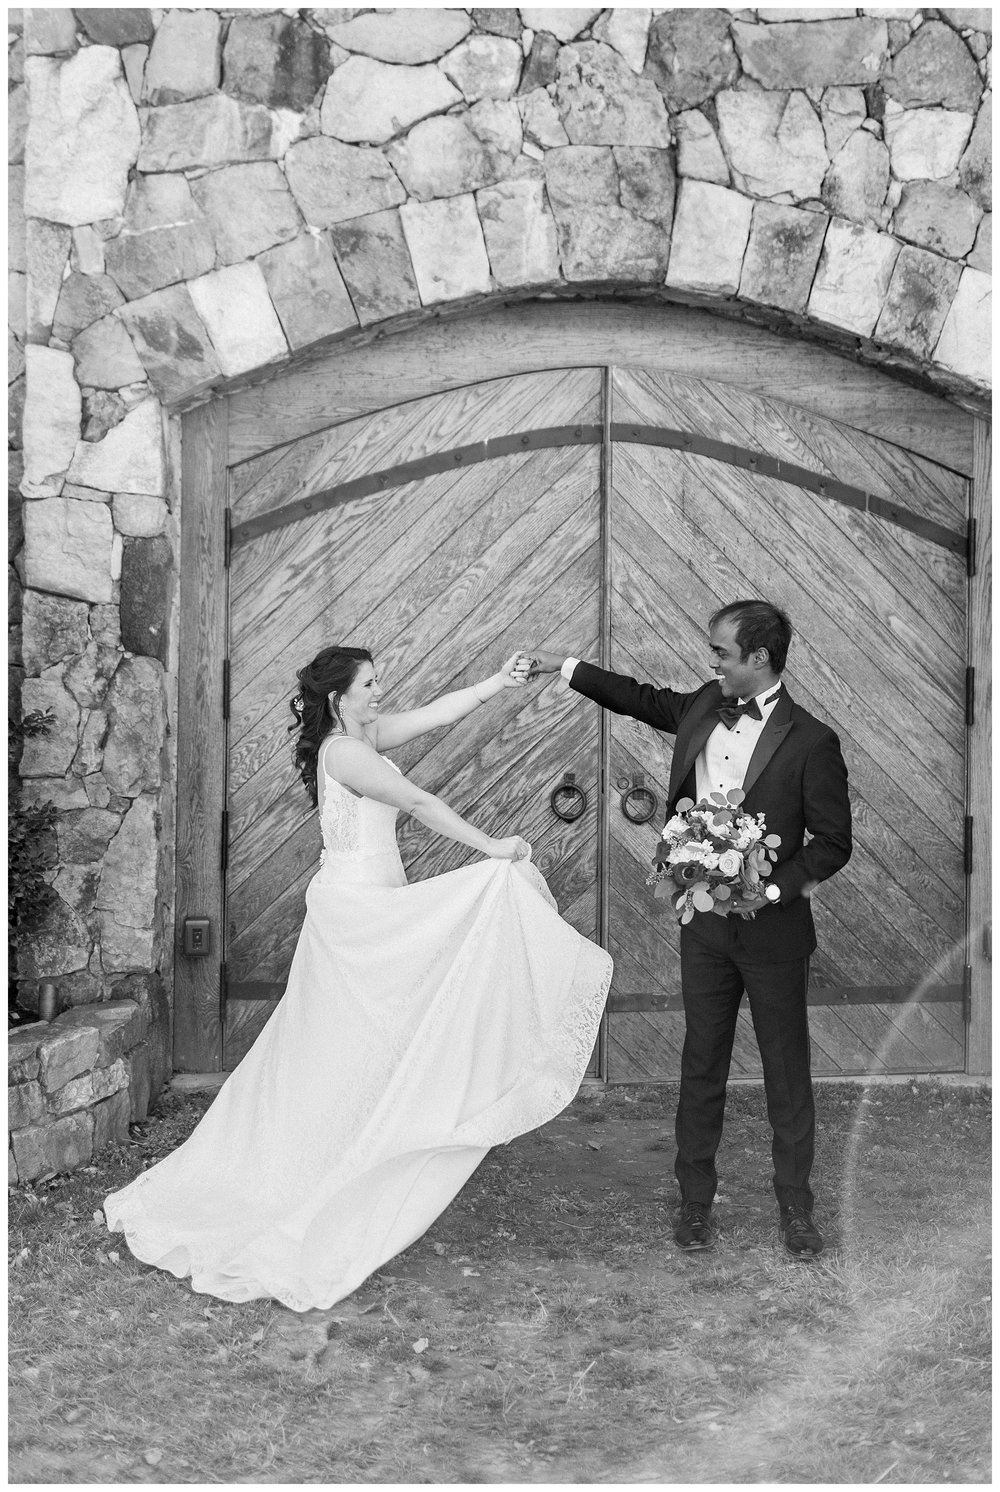 Stone Tower Winery Wedding | Virginia Winter Wedding | VA Wedding Photographer Kir Tuben_0049.jpg